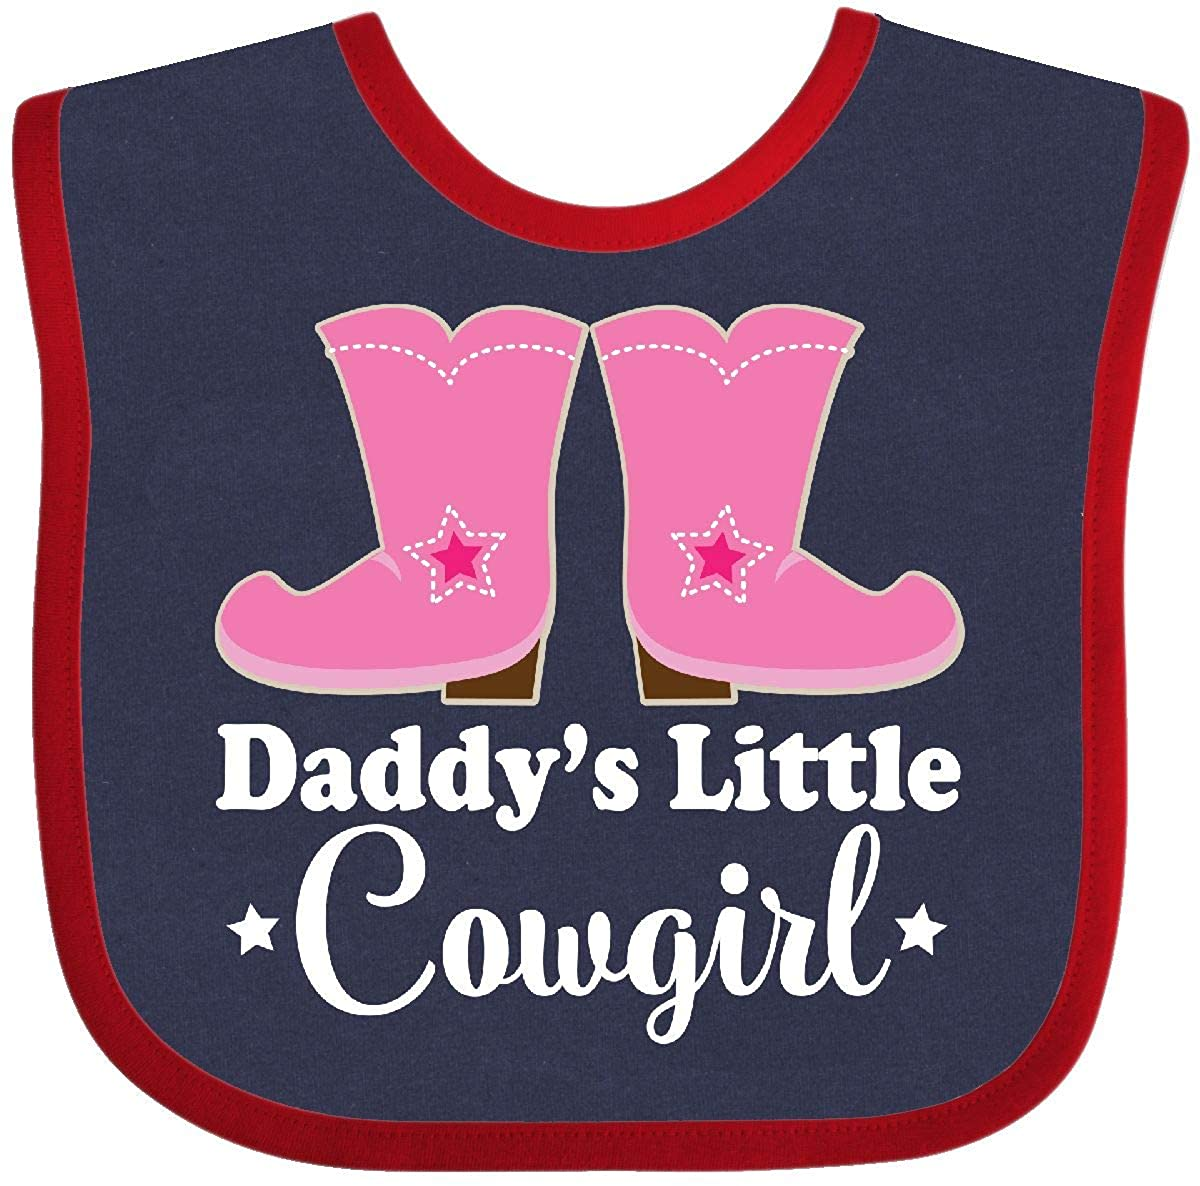 Inktastic Daddy/'s Little Cowgirl Baby Bib Boots Pink Cowboy Western Cute Girls